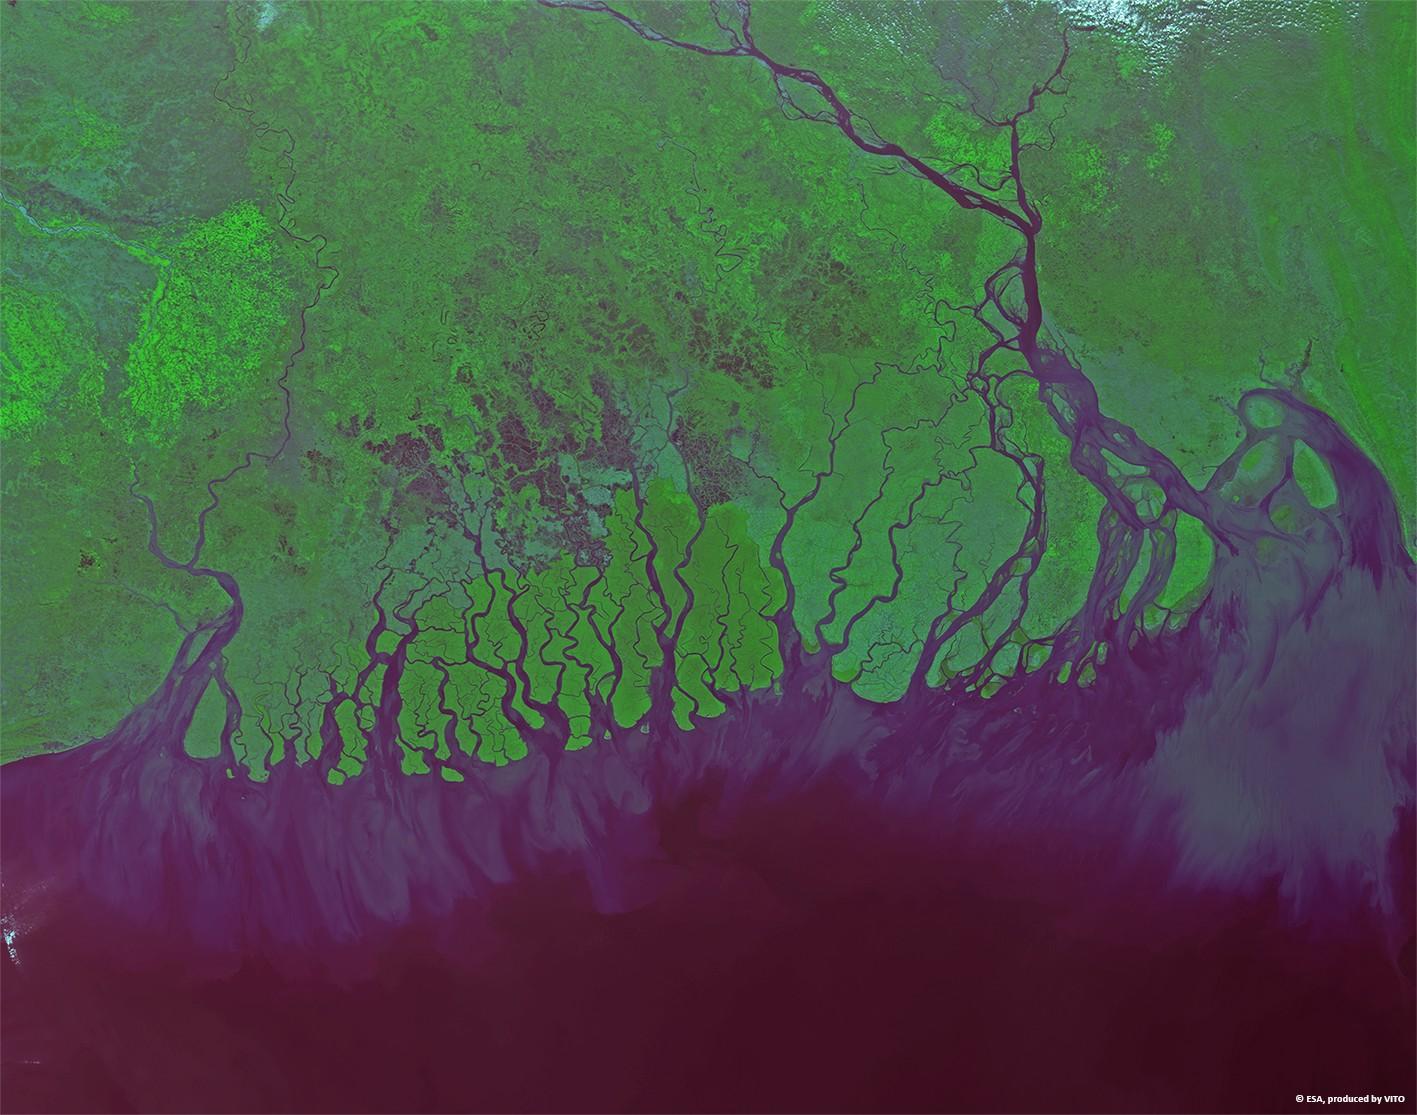 http://www.esa.int/var/esa/storage/images/esa_multimedia/images/2014/02/mouth_of_ganges_at_100-m_resolution/14280141-2-eng-GB/Mouth_of_Ganges_at_100-m_resolution.jpg